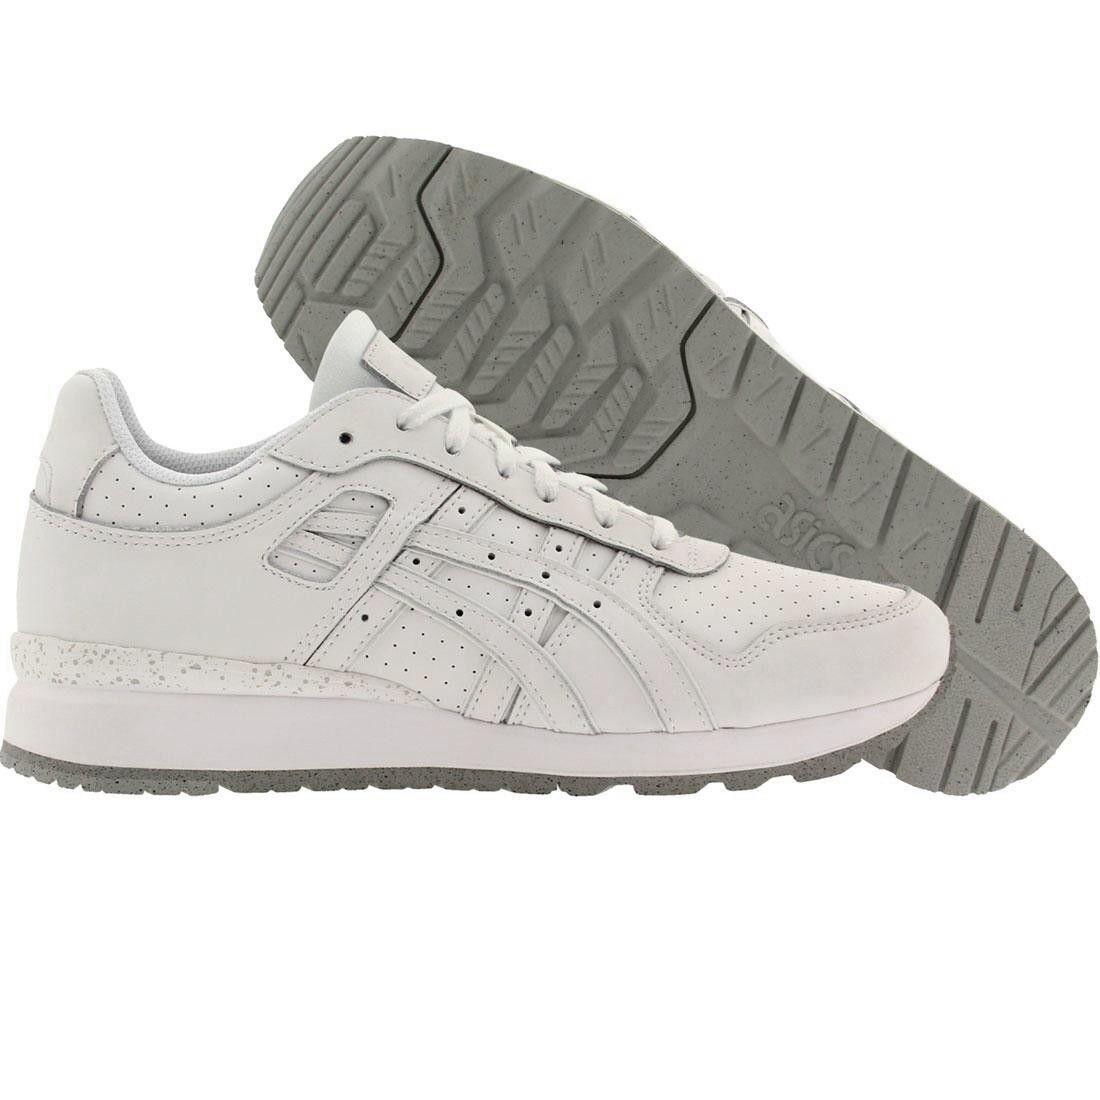 New Asics H50FK.0101 GT II Retro White   Grey Men Running shoes Bone Size 11.5